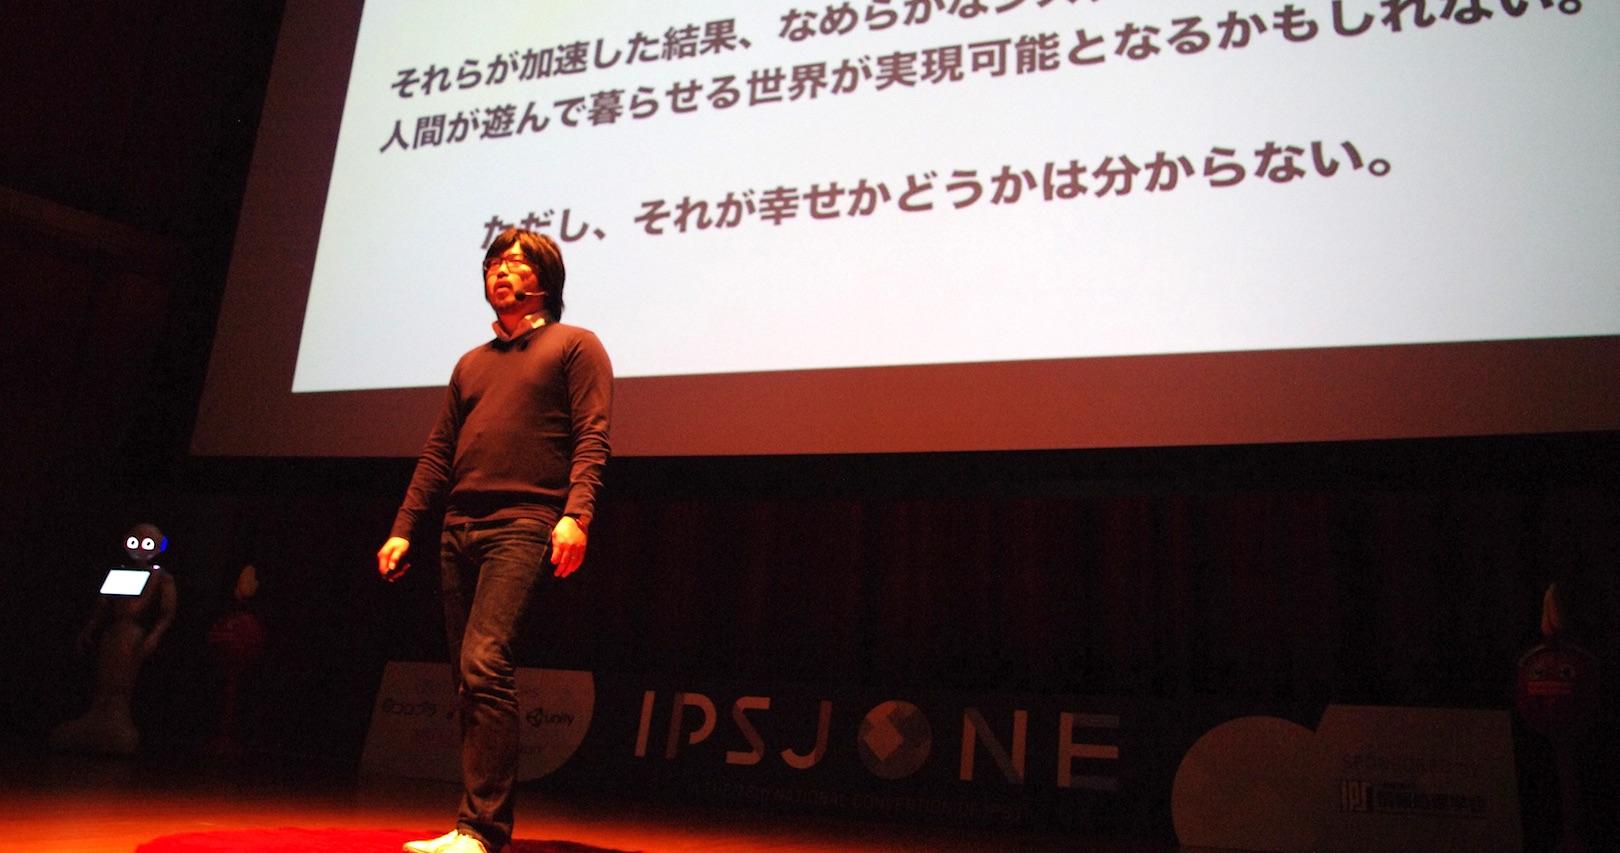 IPSJ-ONE 2016